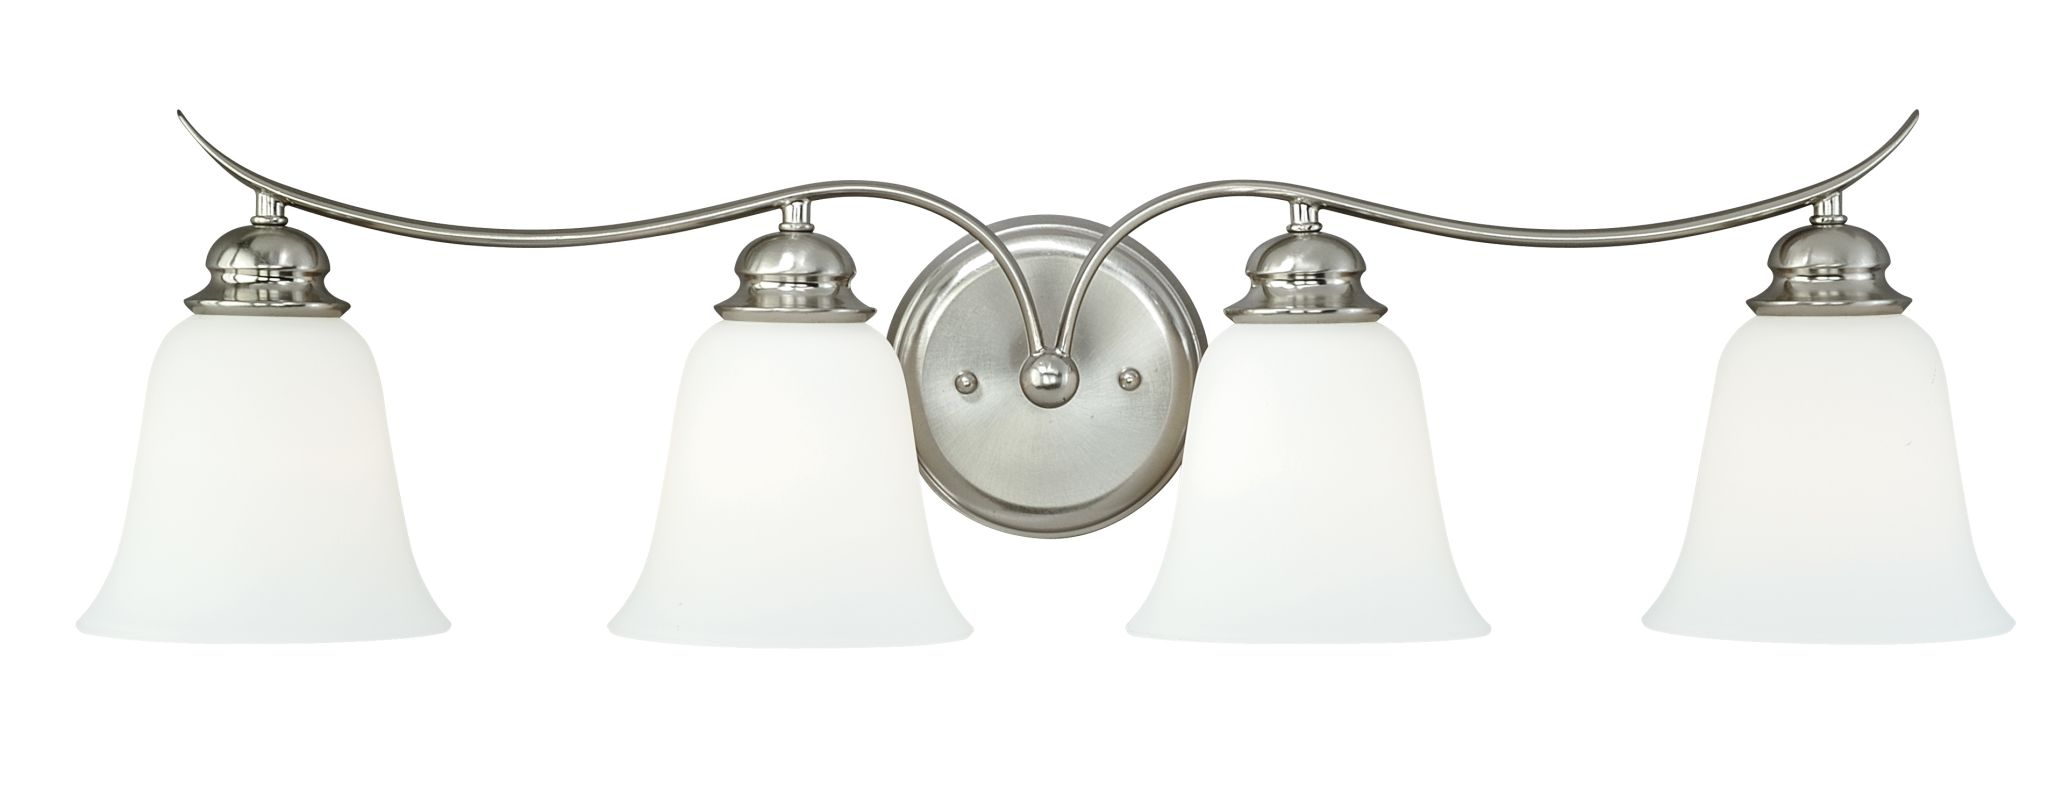 Vaxcel Lighting W0092 Darby 4 Light Bathroom Vanity Light - 31 Inches